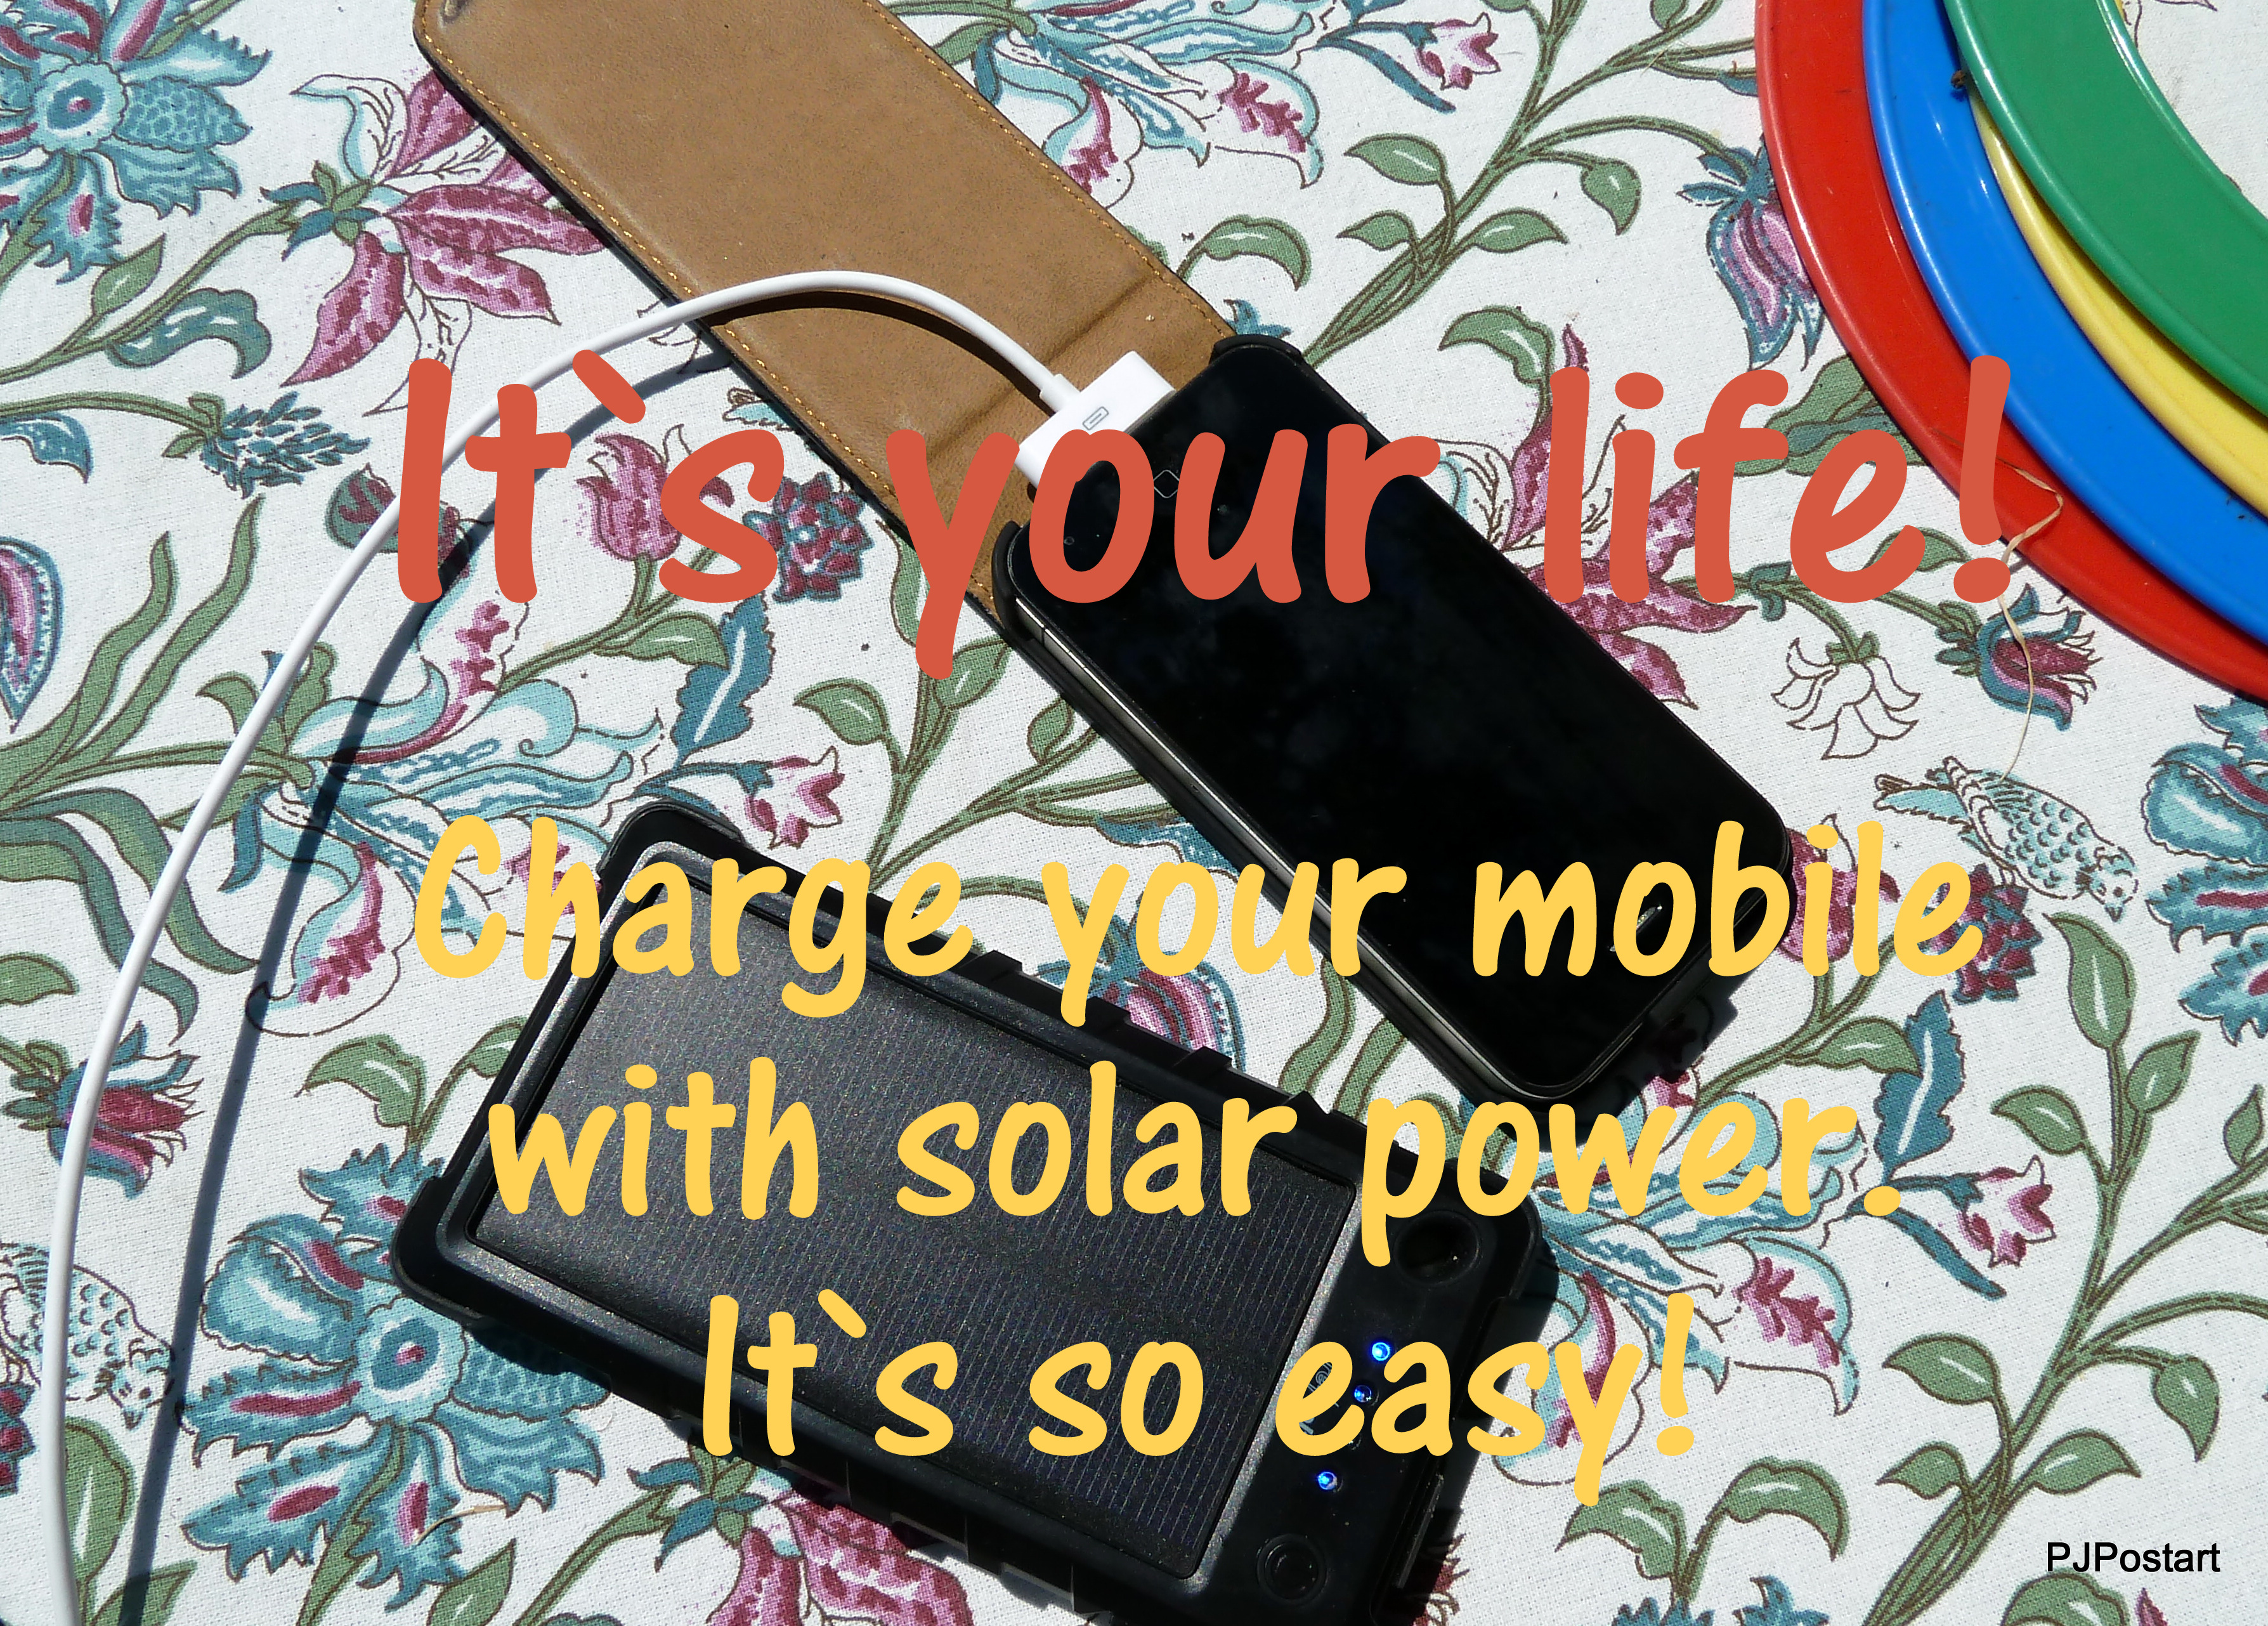 001_Mobile-solar_2